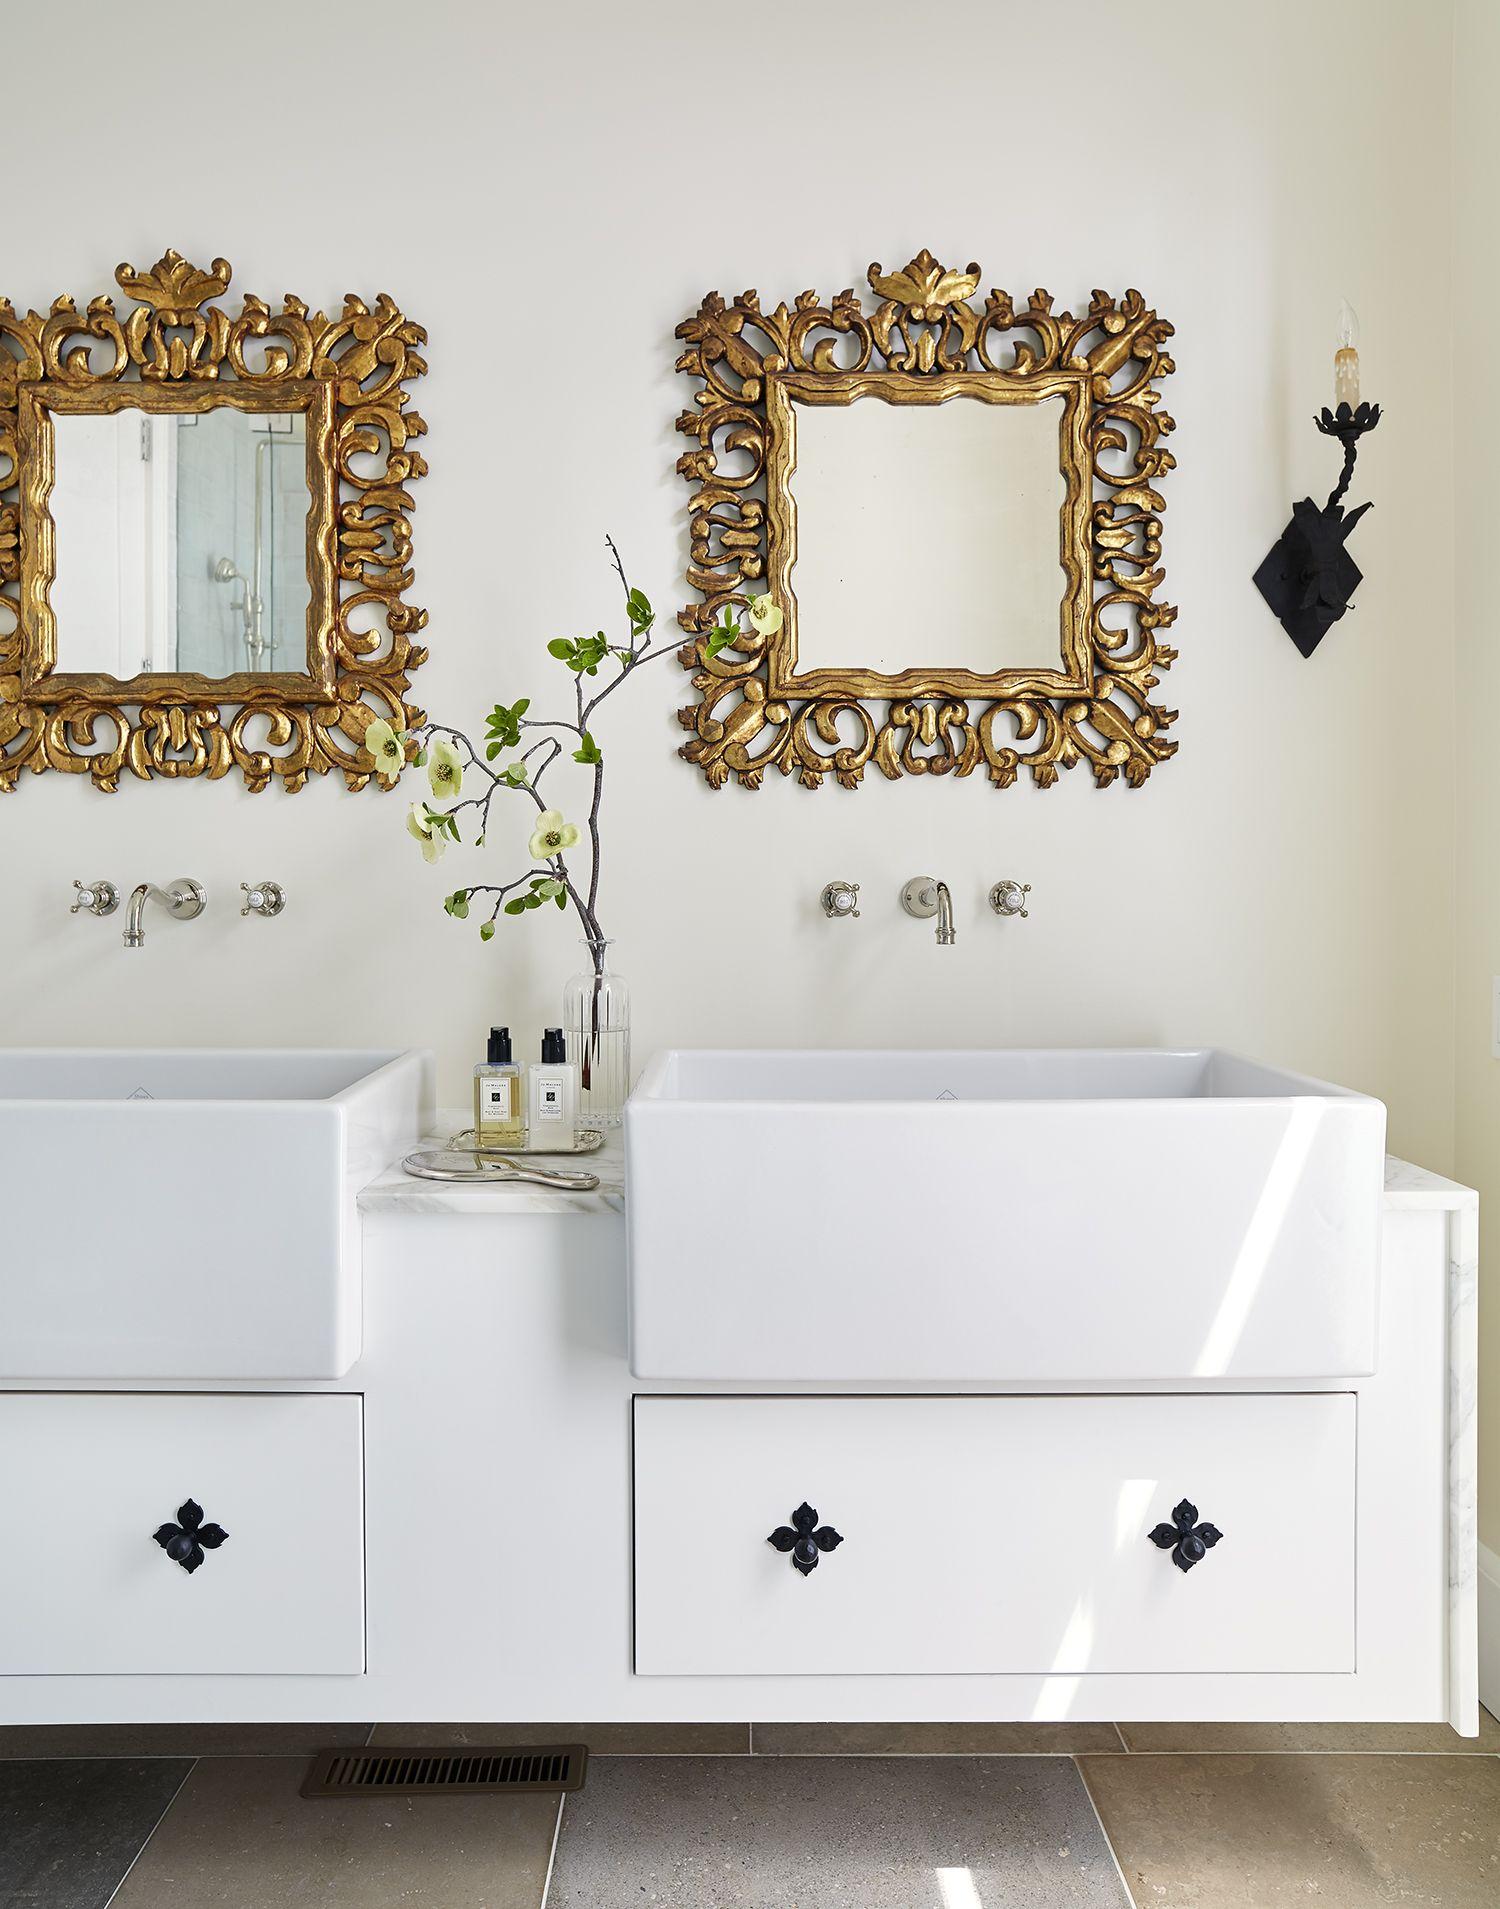 Beautiful white bathroom with rectangular inward sink with elaborate